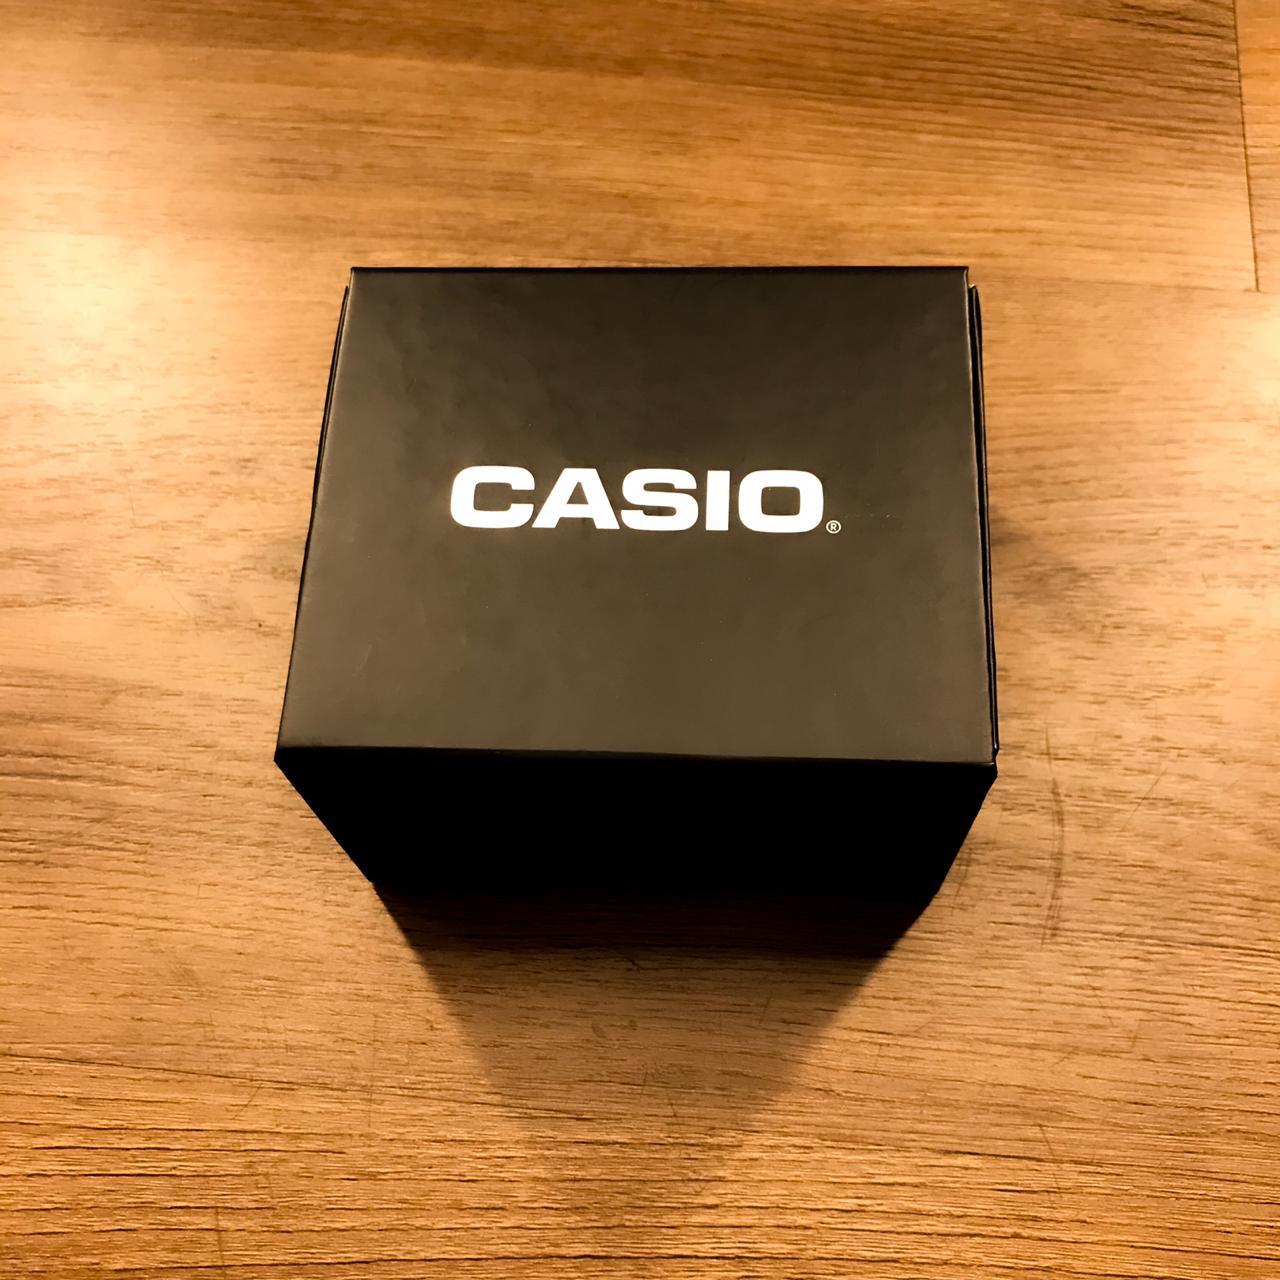 Relógio Casio Vintage Caixa Prata - F-91WM-7A